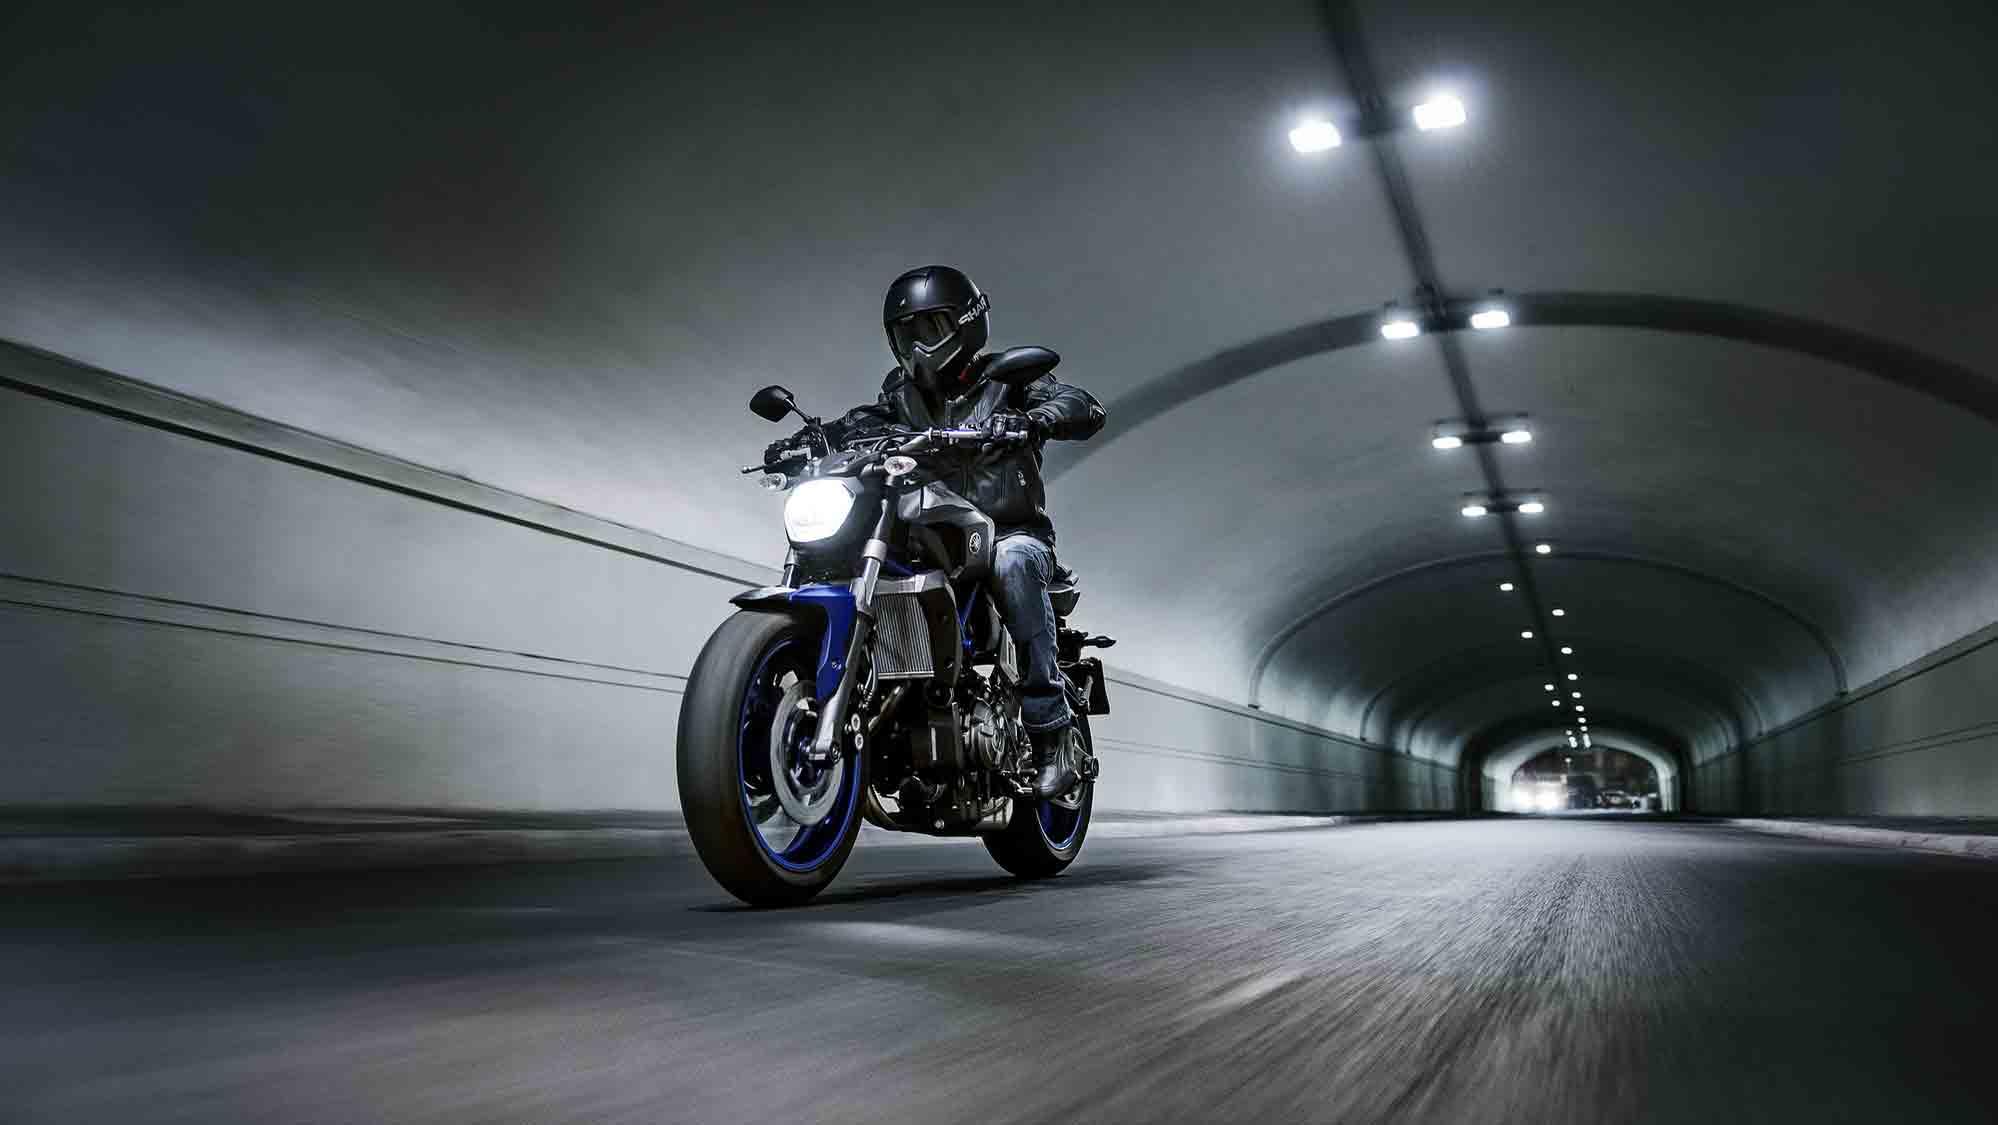 goedkoop motorrijles